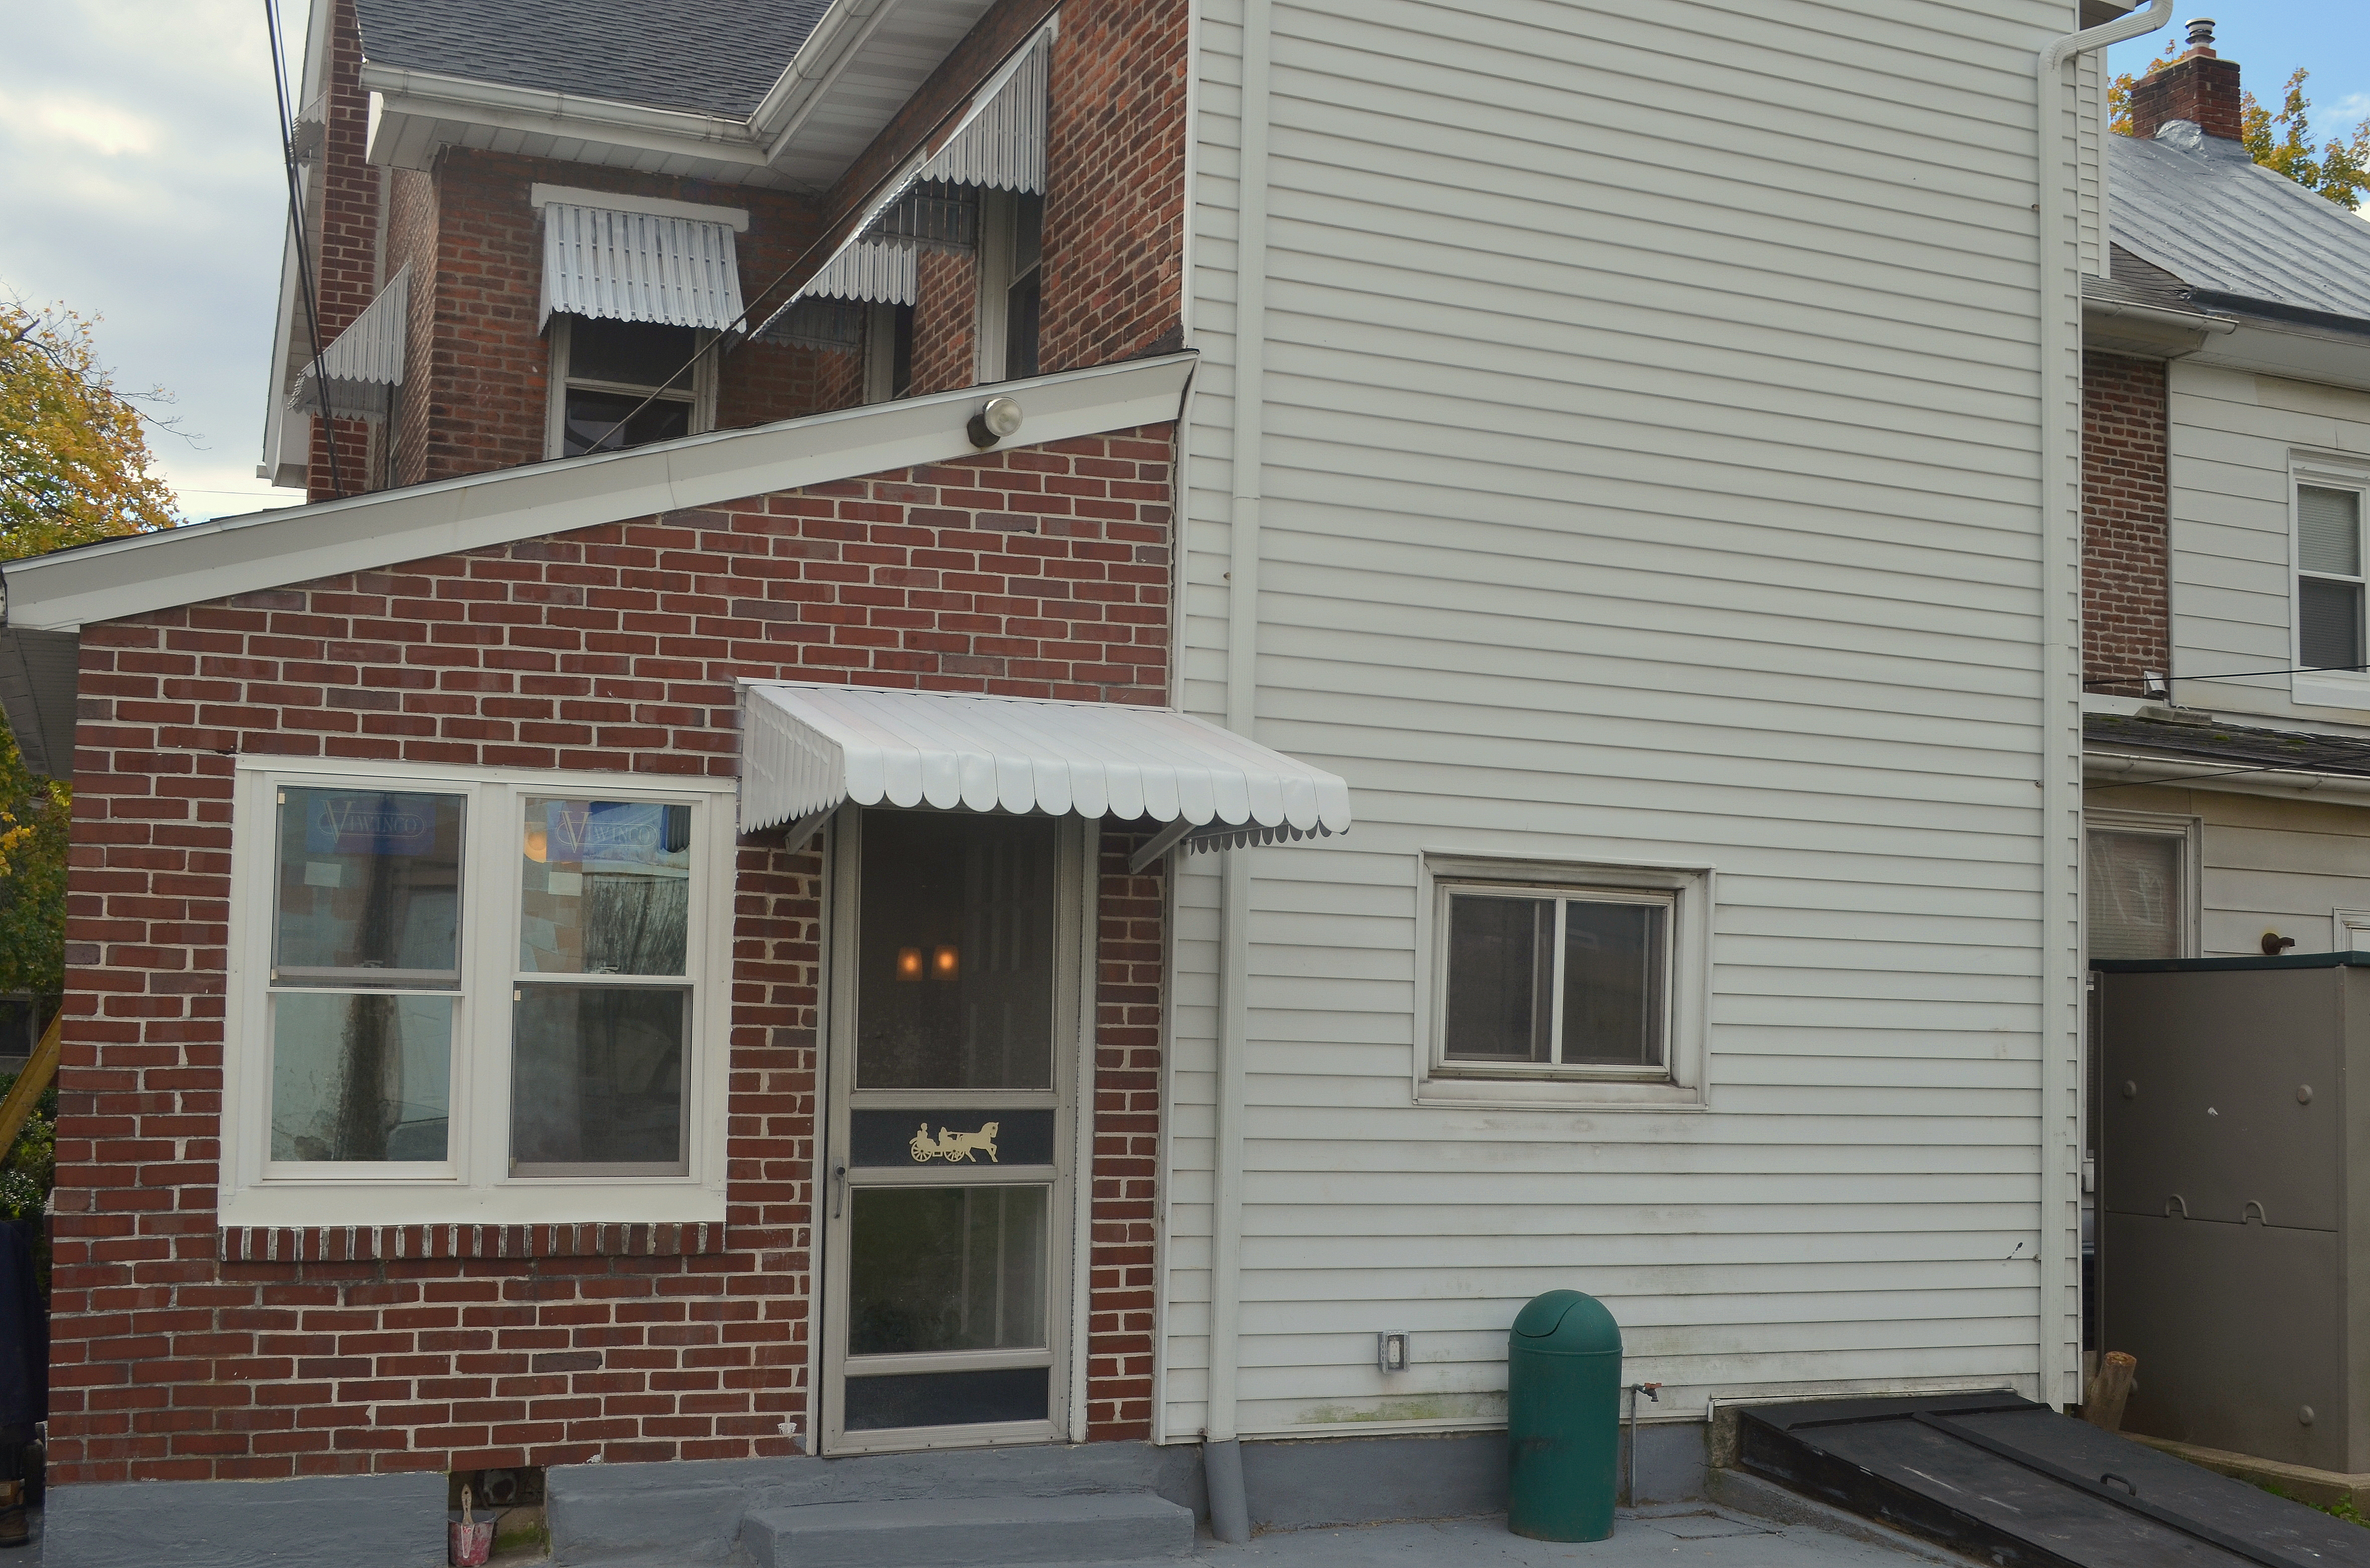 441 Cherry St, Pottstown, PA 19464 - exterior_rear_2